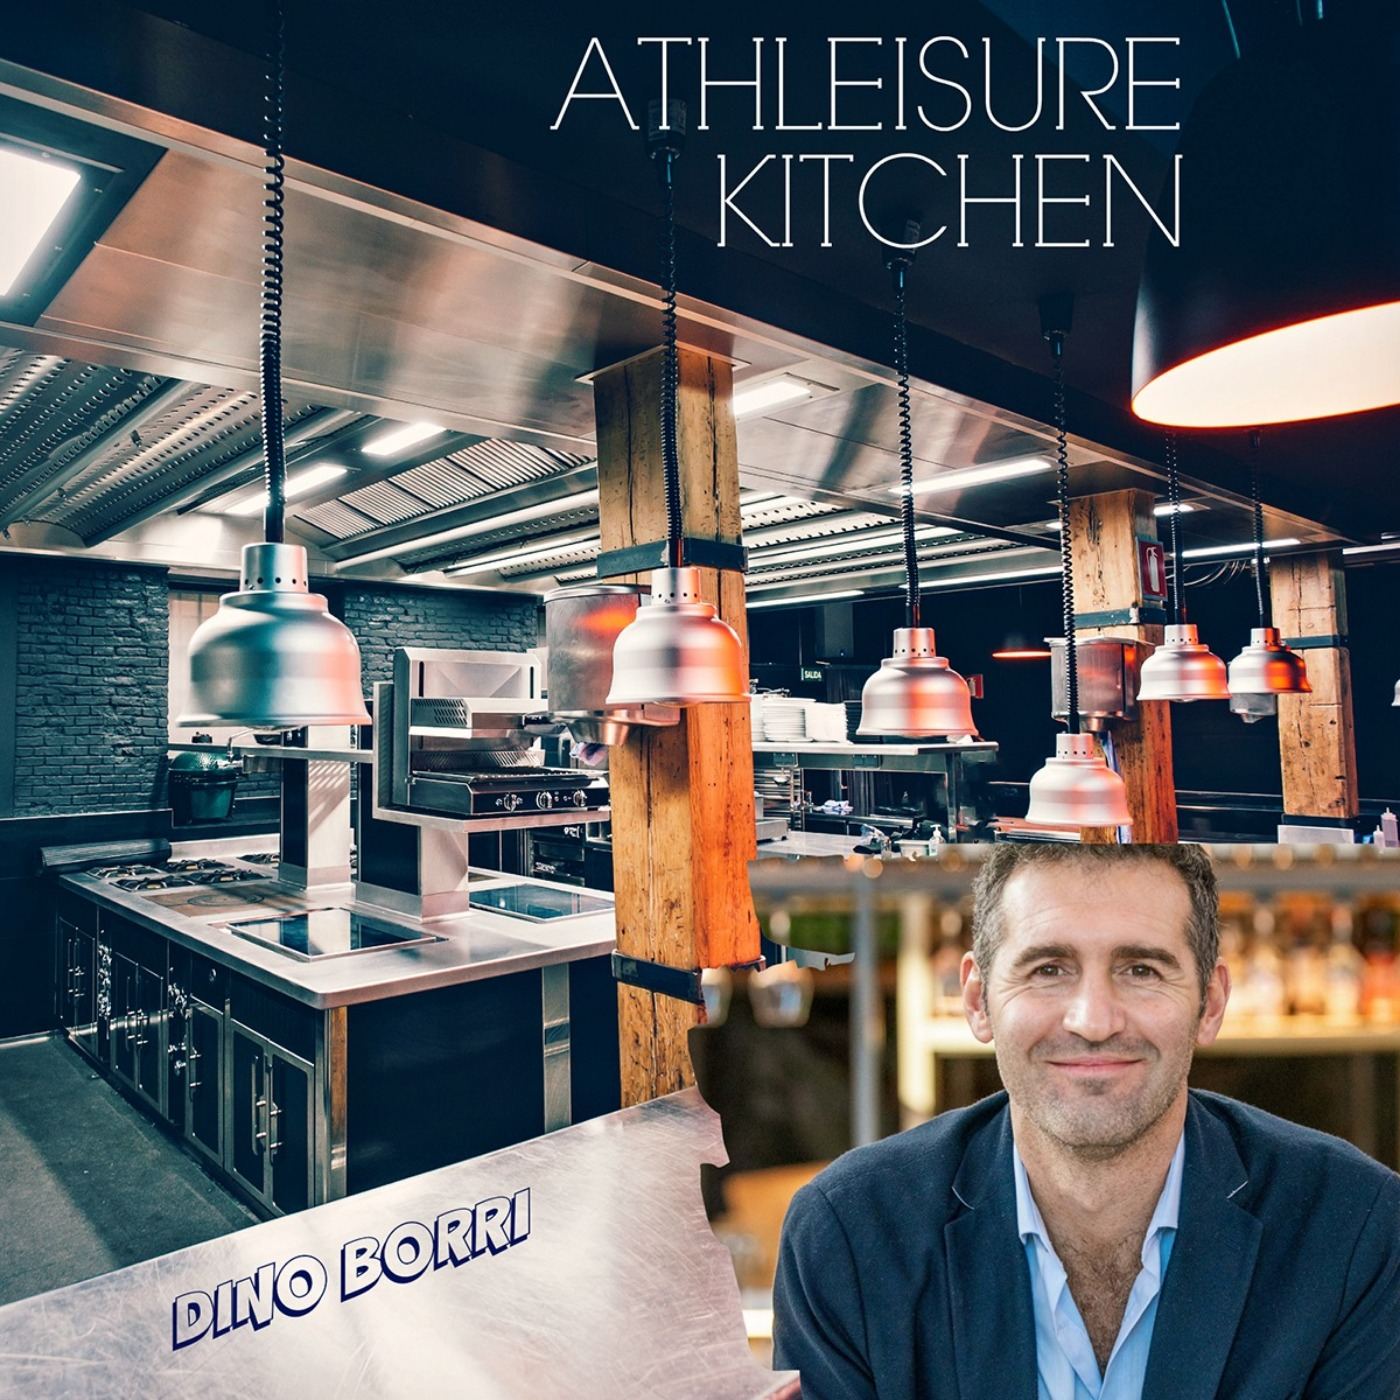 S1. Ep 5. | Athleisure Kitchen with Eataly's VP of Global Partnships Dino Borri